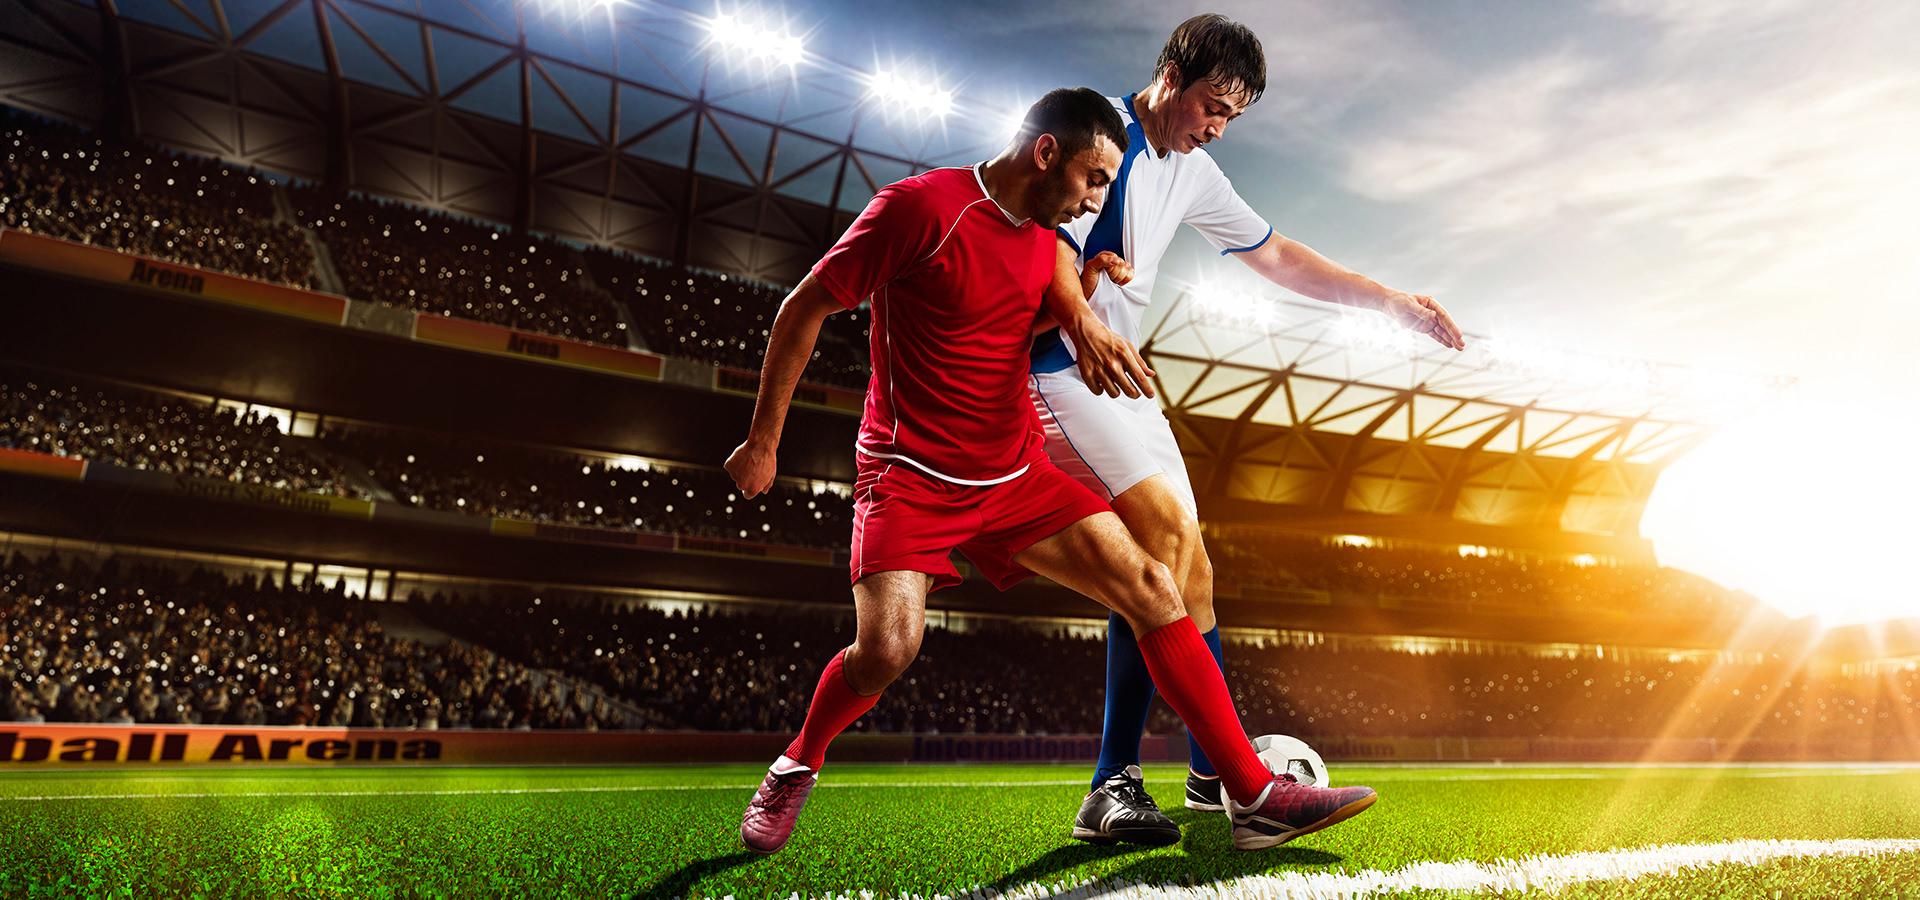 soccerhouse24